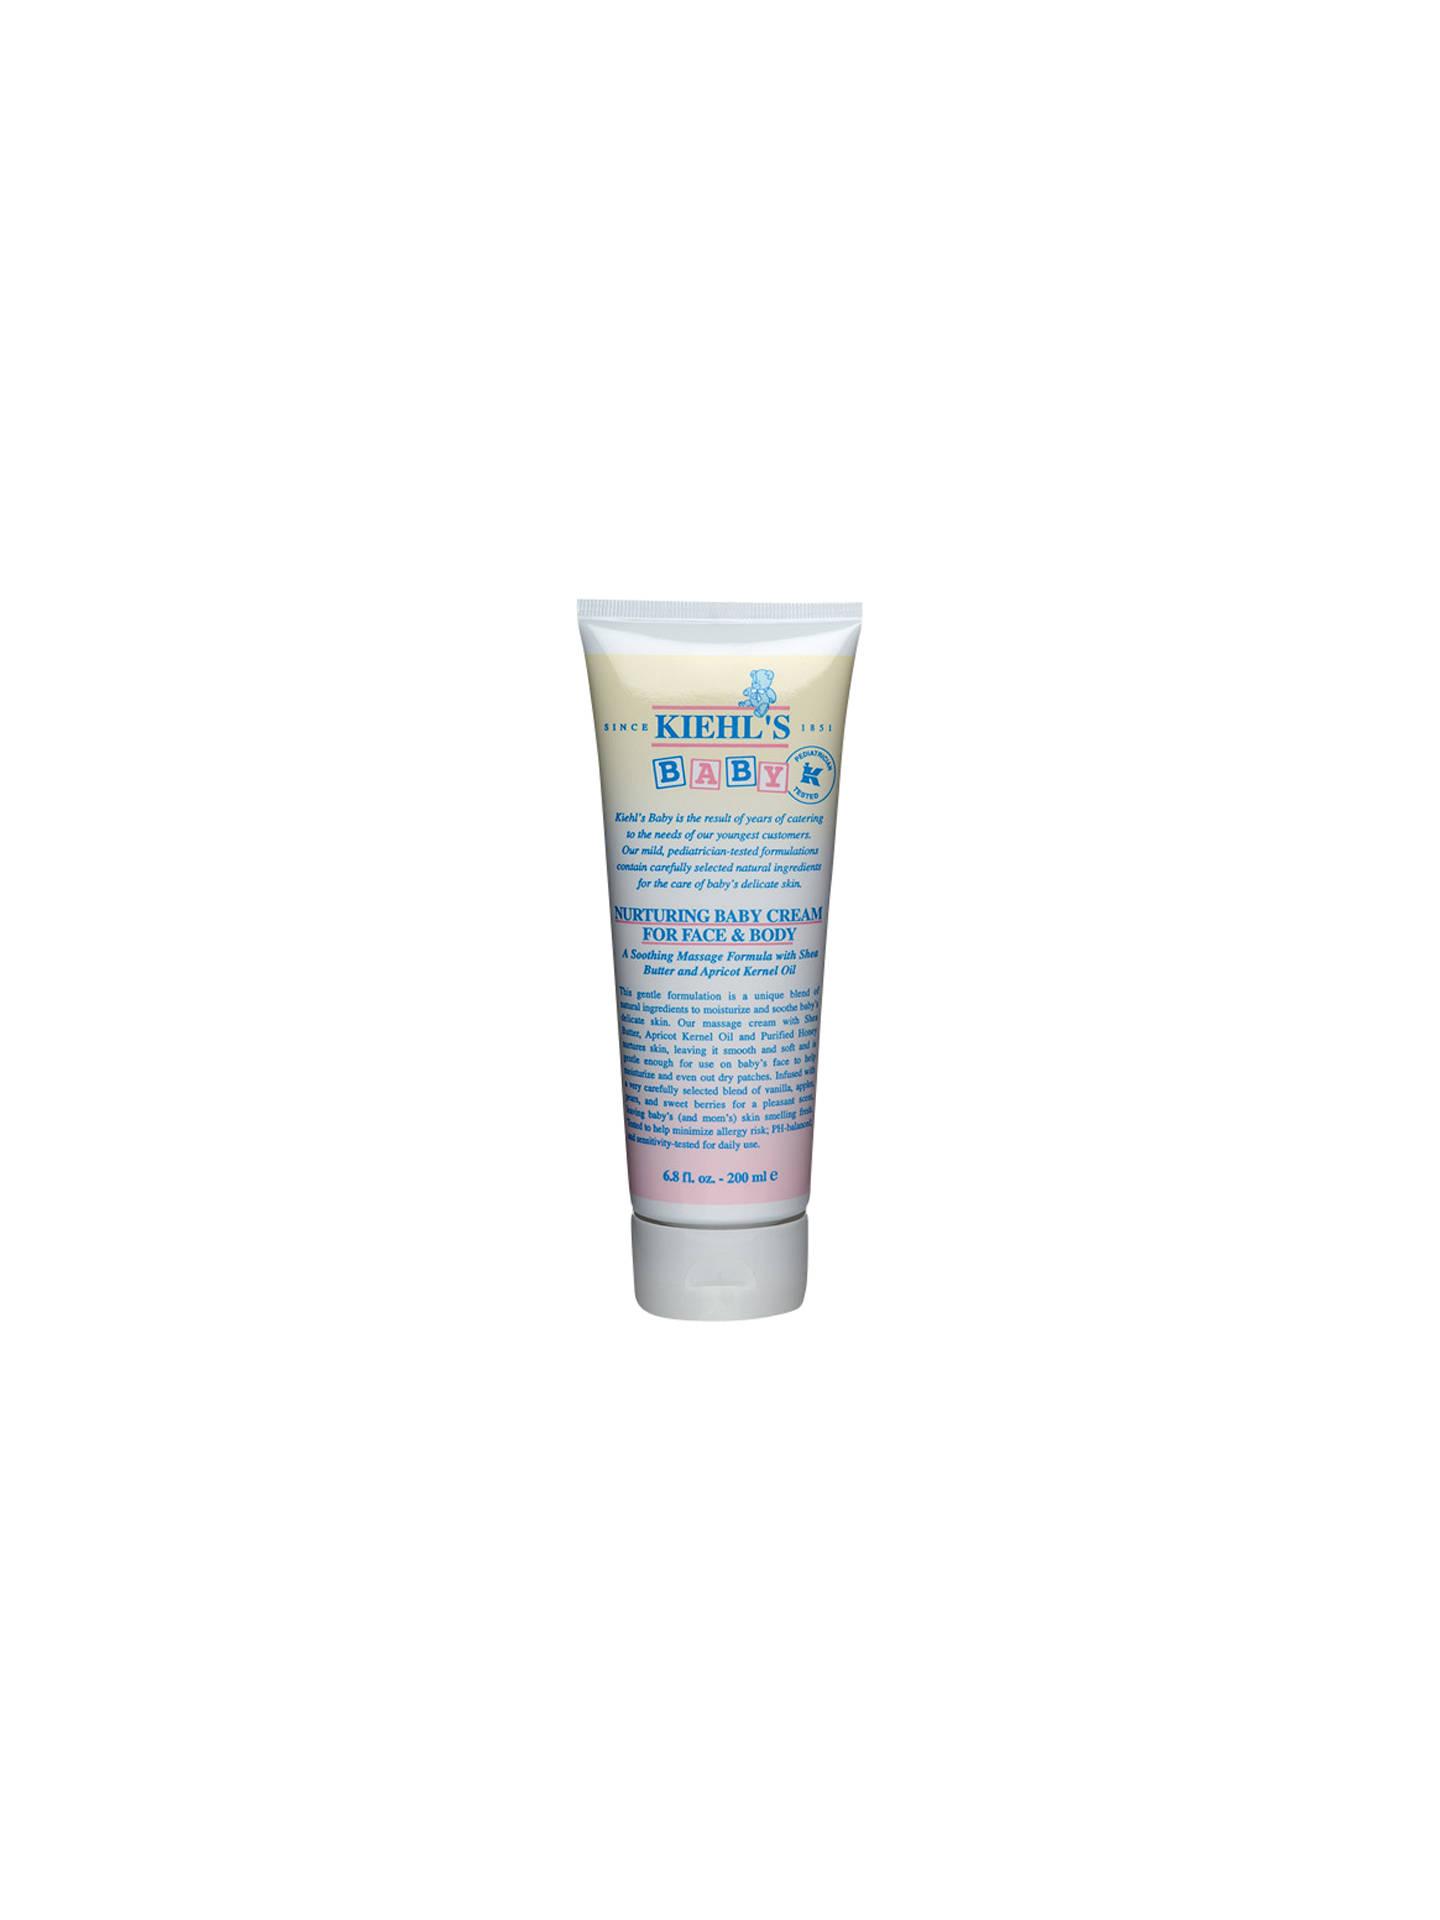 Kiehl's Nurturing Baby Cream for Face and Body, 200ml